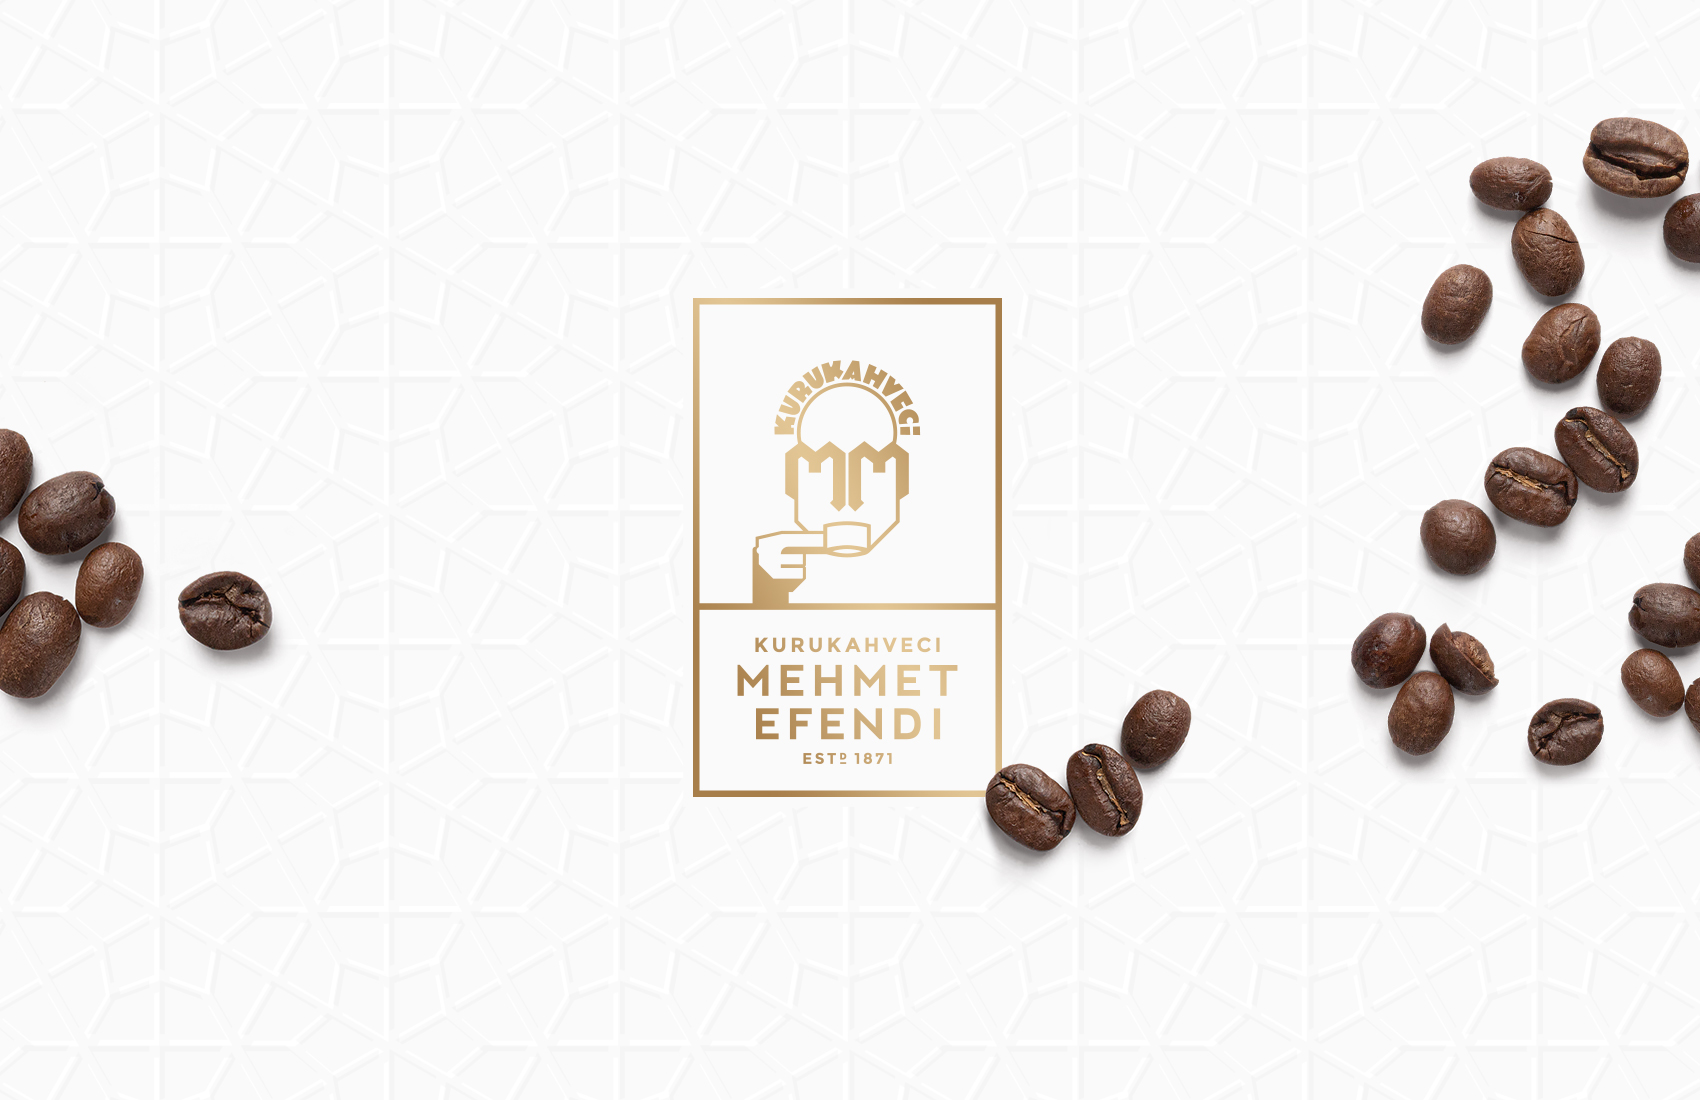 emretelli_kurukahvecimehmetefendi_new-brandlogo_1700